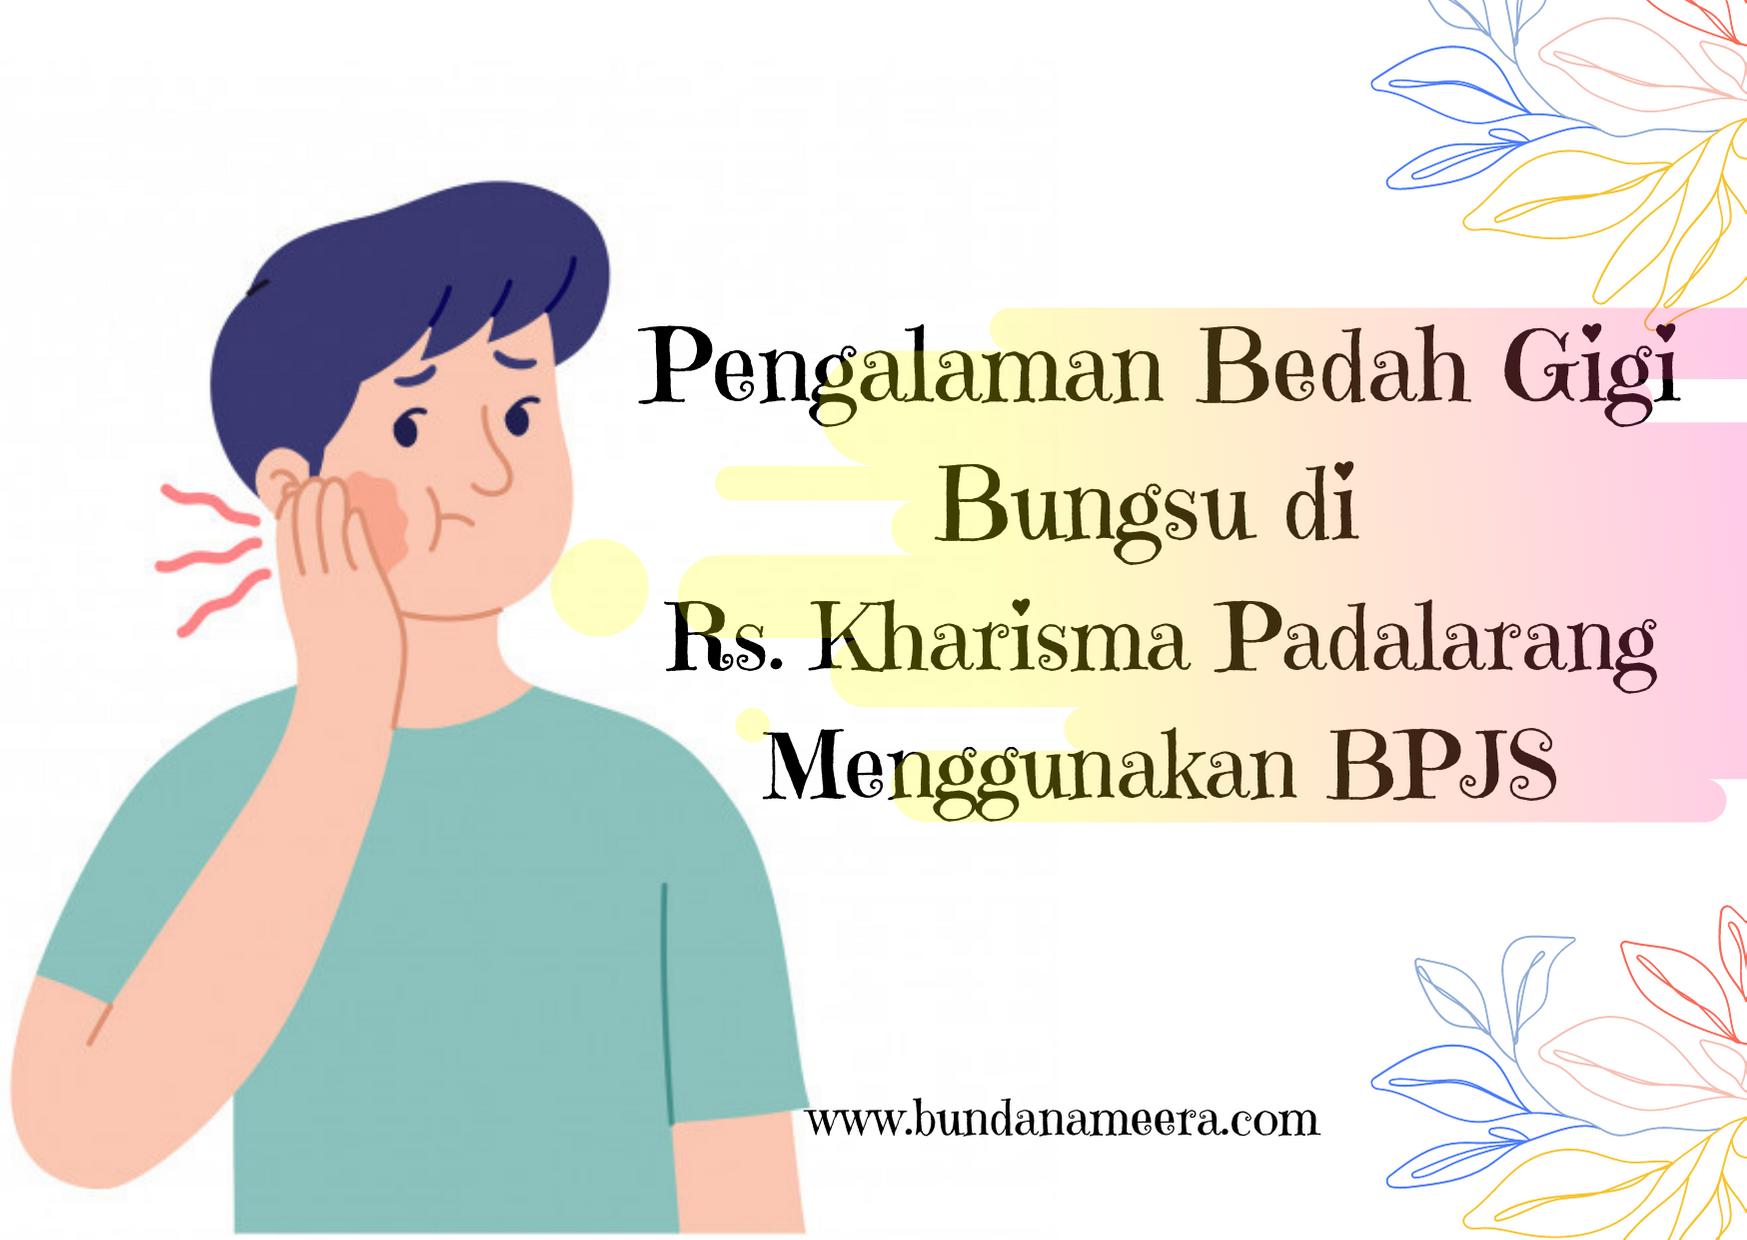 operasi-gigi-bungsu-pake-bpjs-di-cimahi